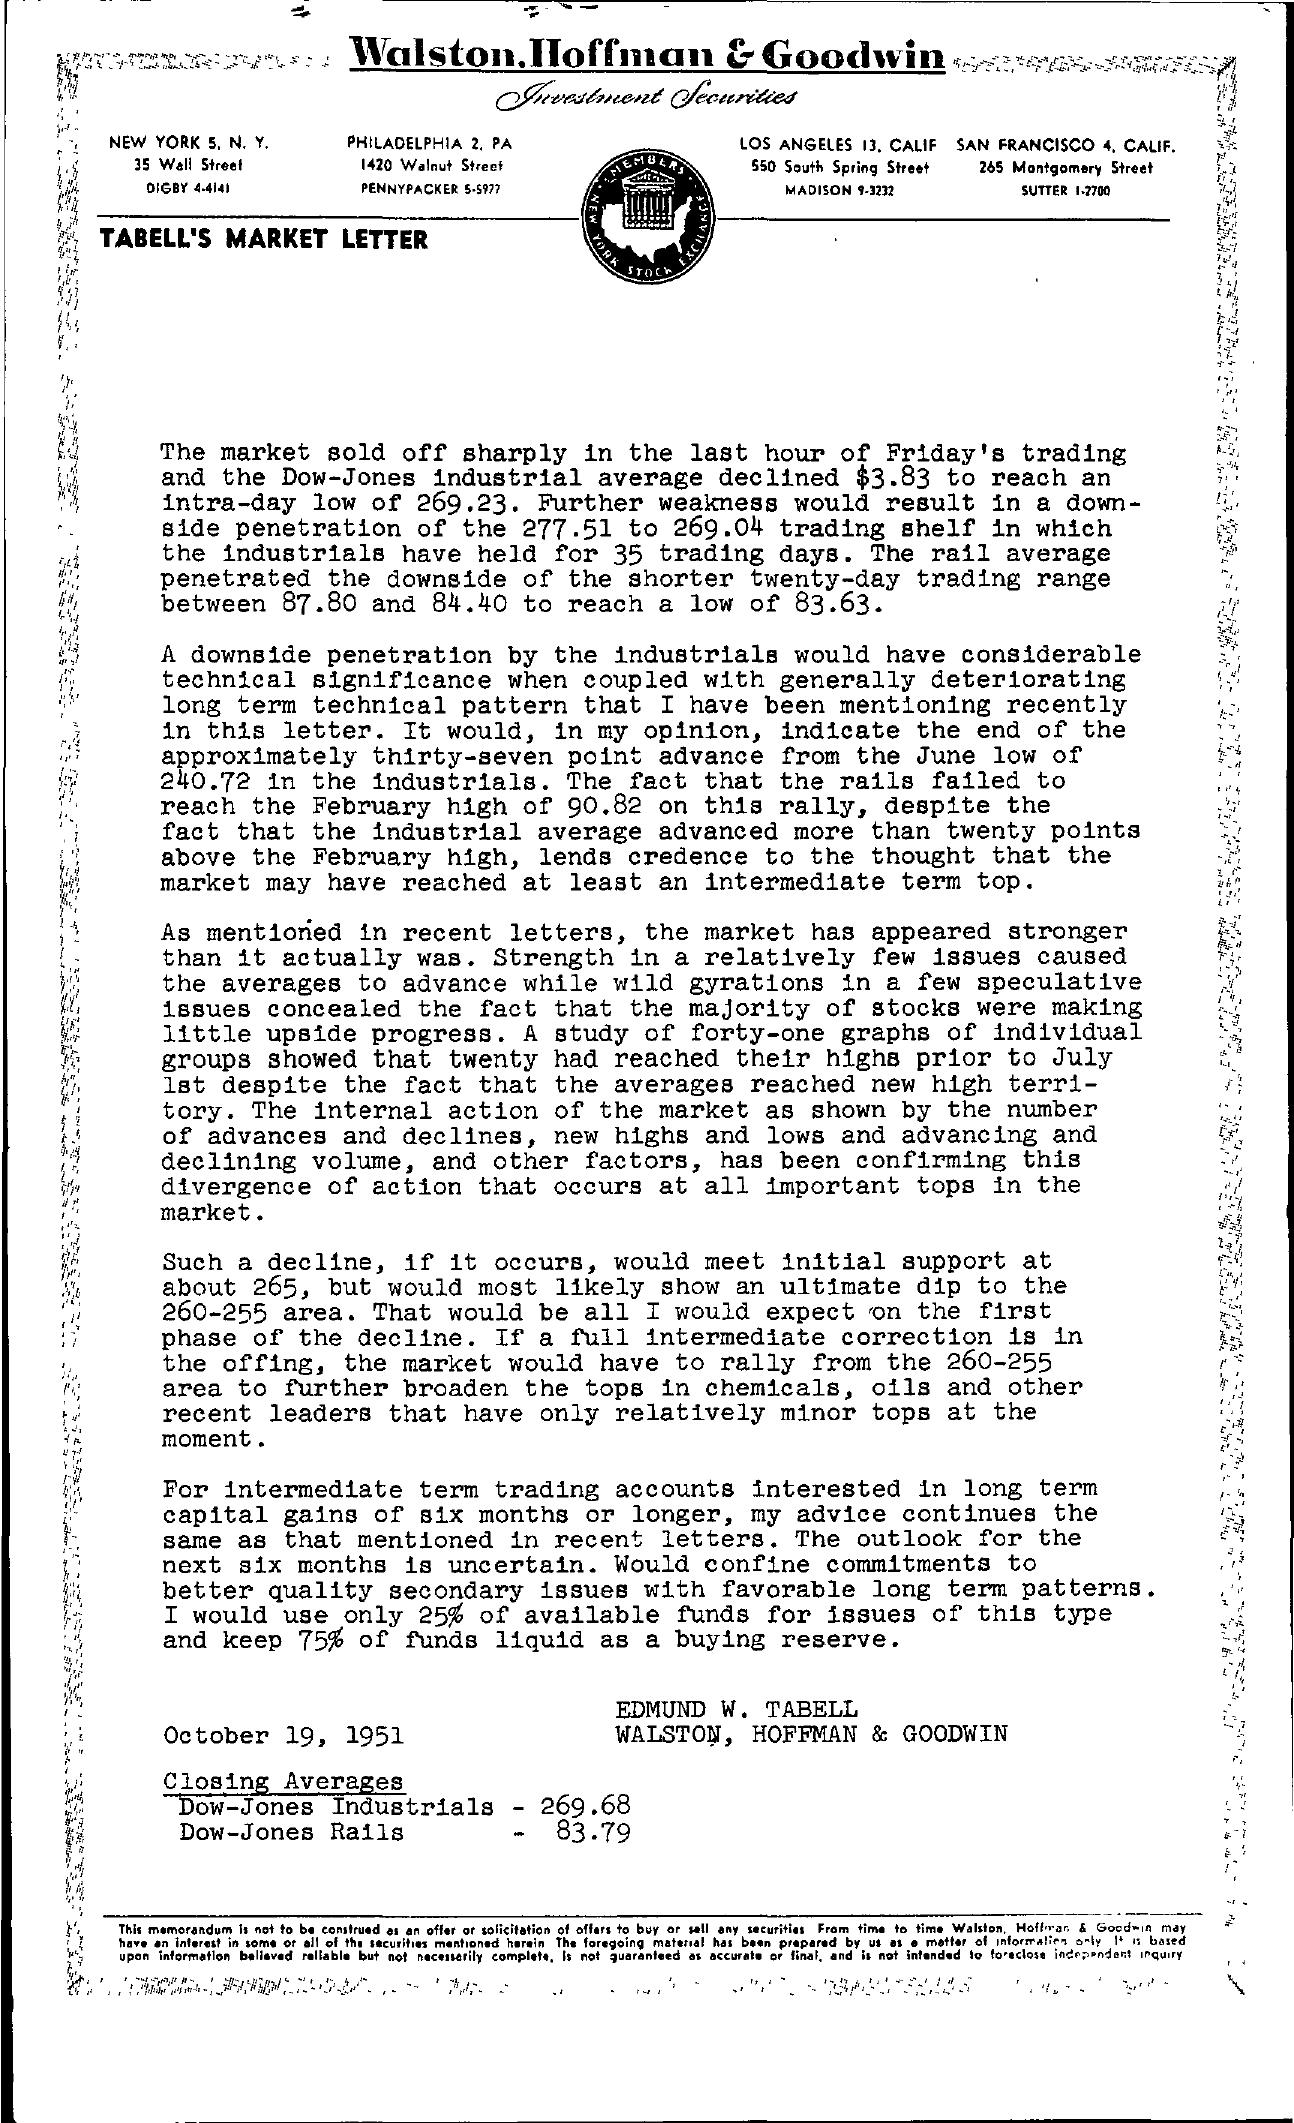 Tabell's Market Letter - October 19, 1951